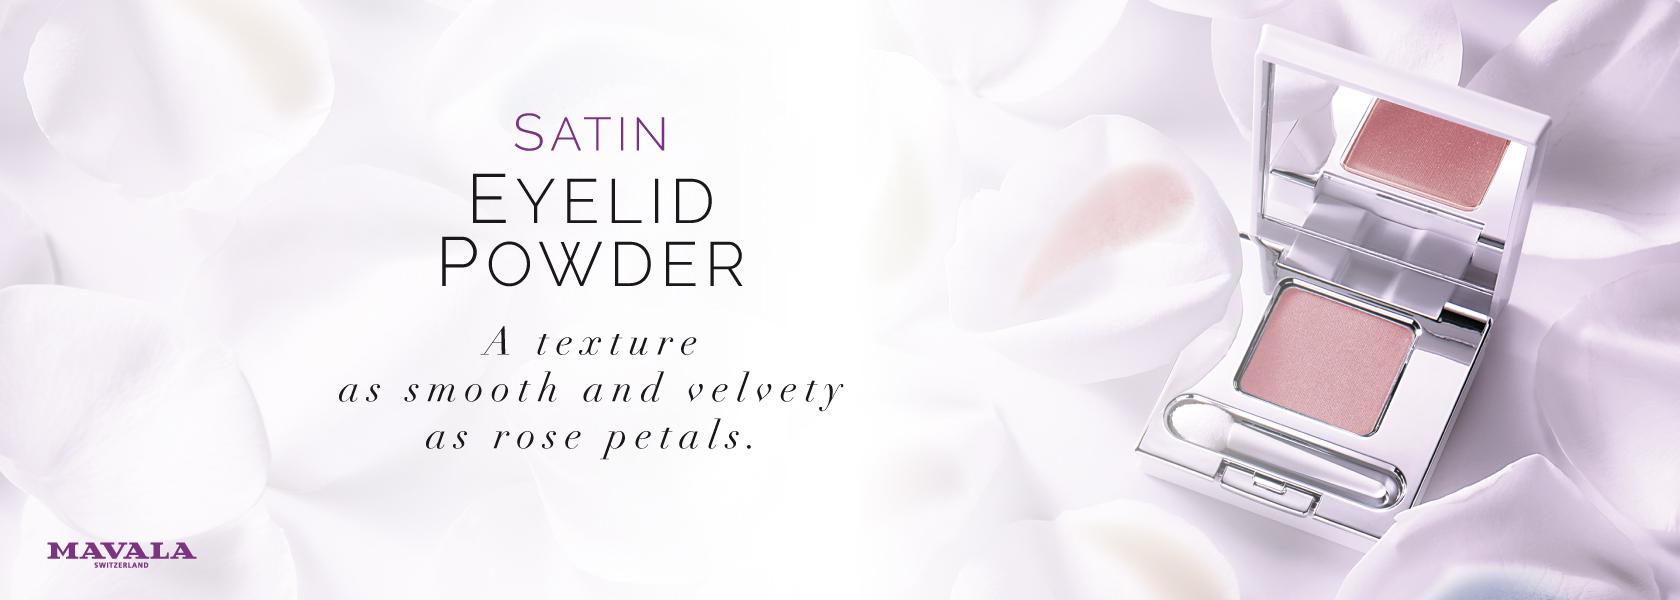 satin-eye-lid-powder.jpg